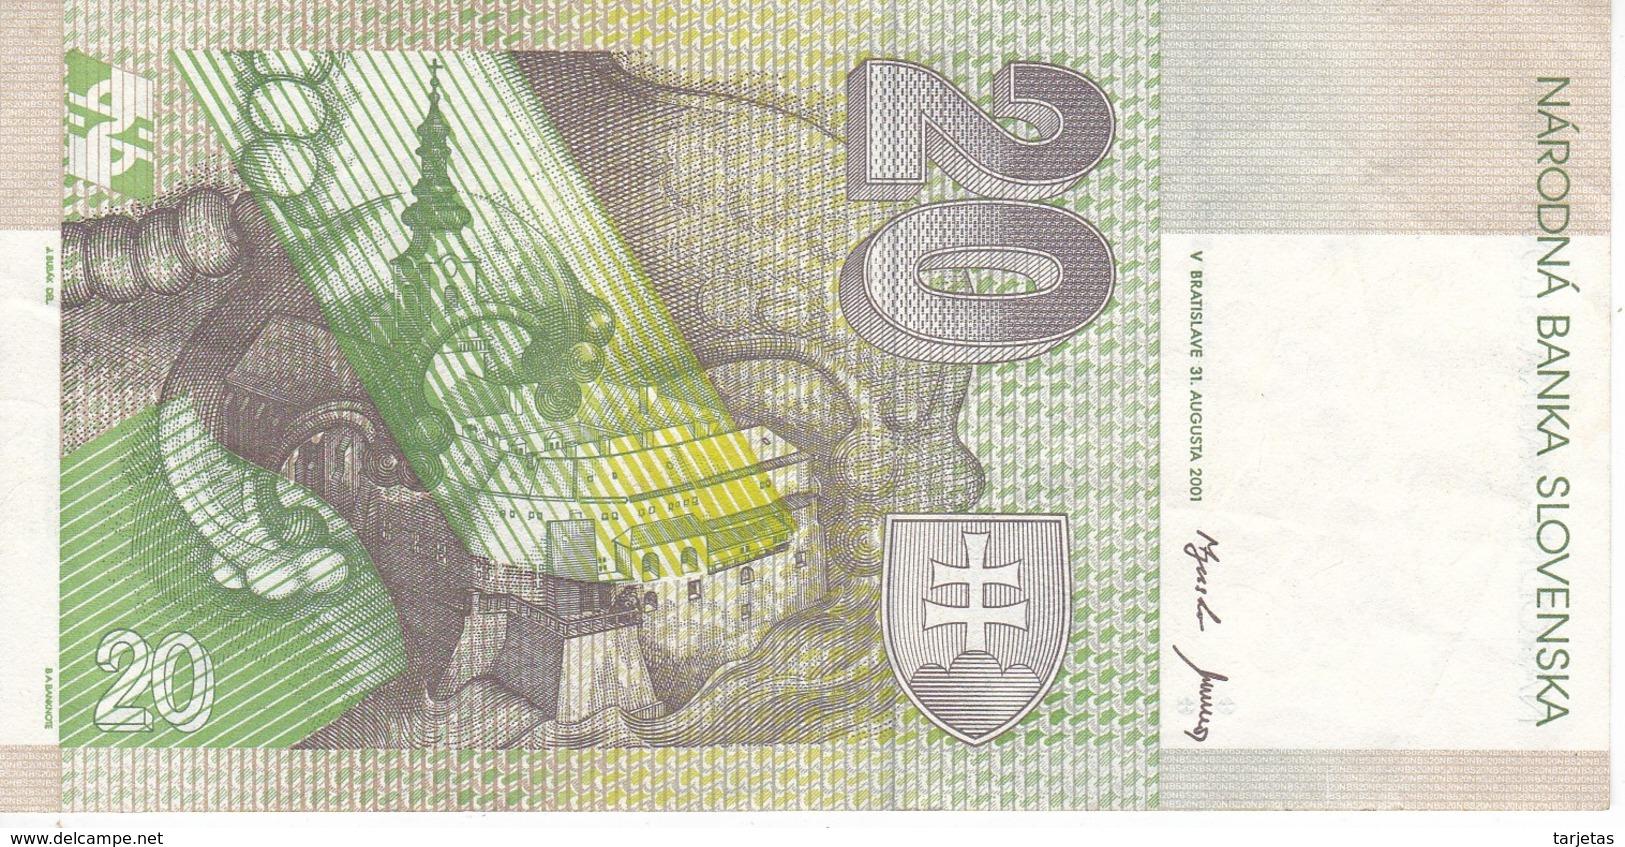 BILLETE DE ESLOVAQUIA DE 20 KORUN DEL AÑO 2001 (BANK NOTE) - Slovacchia